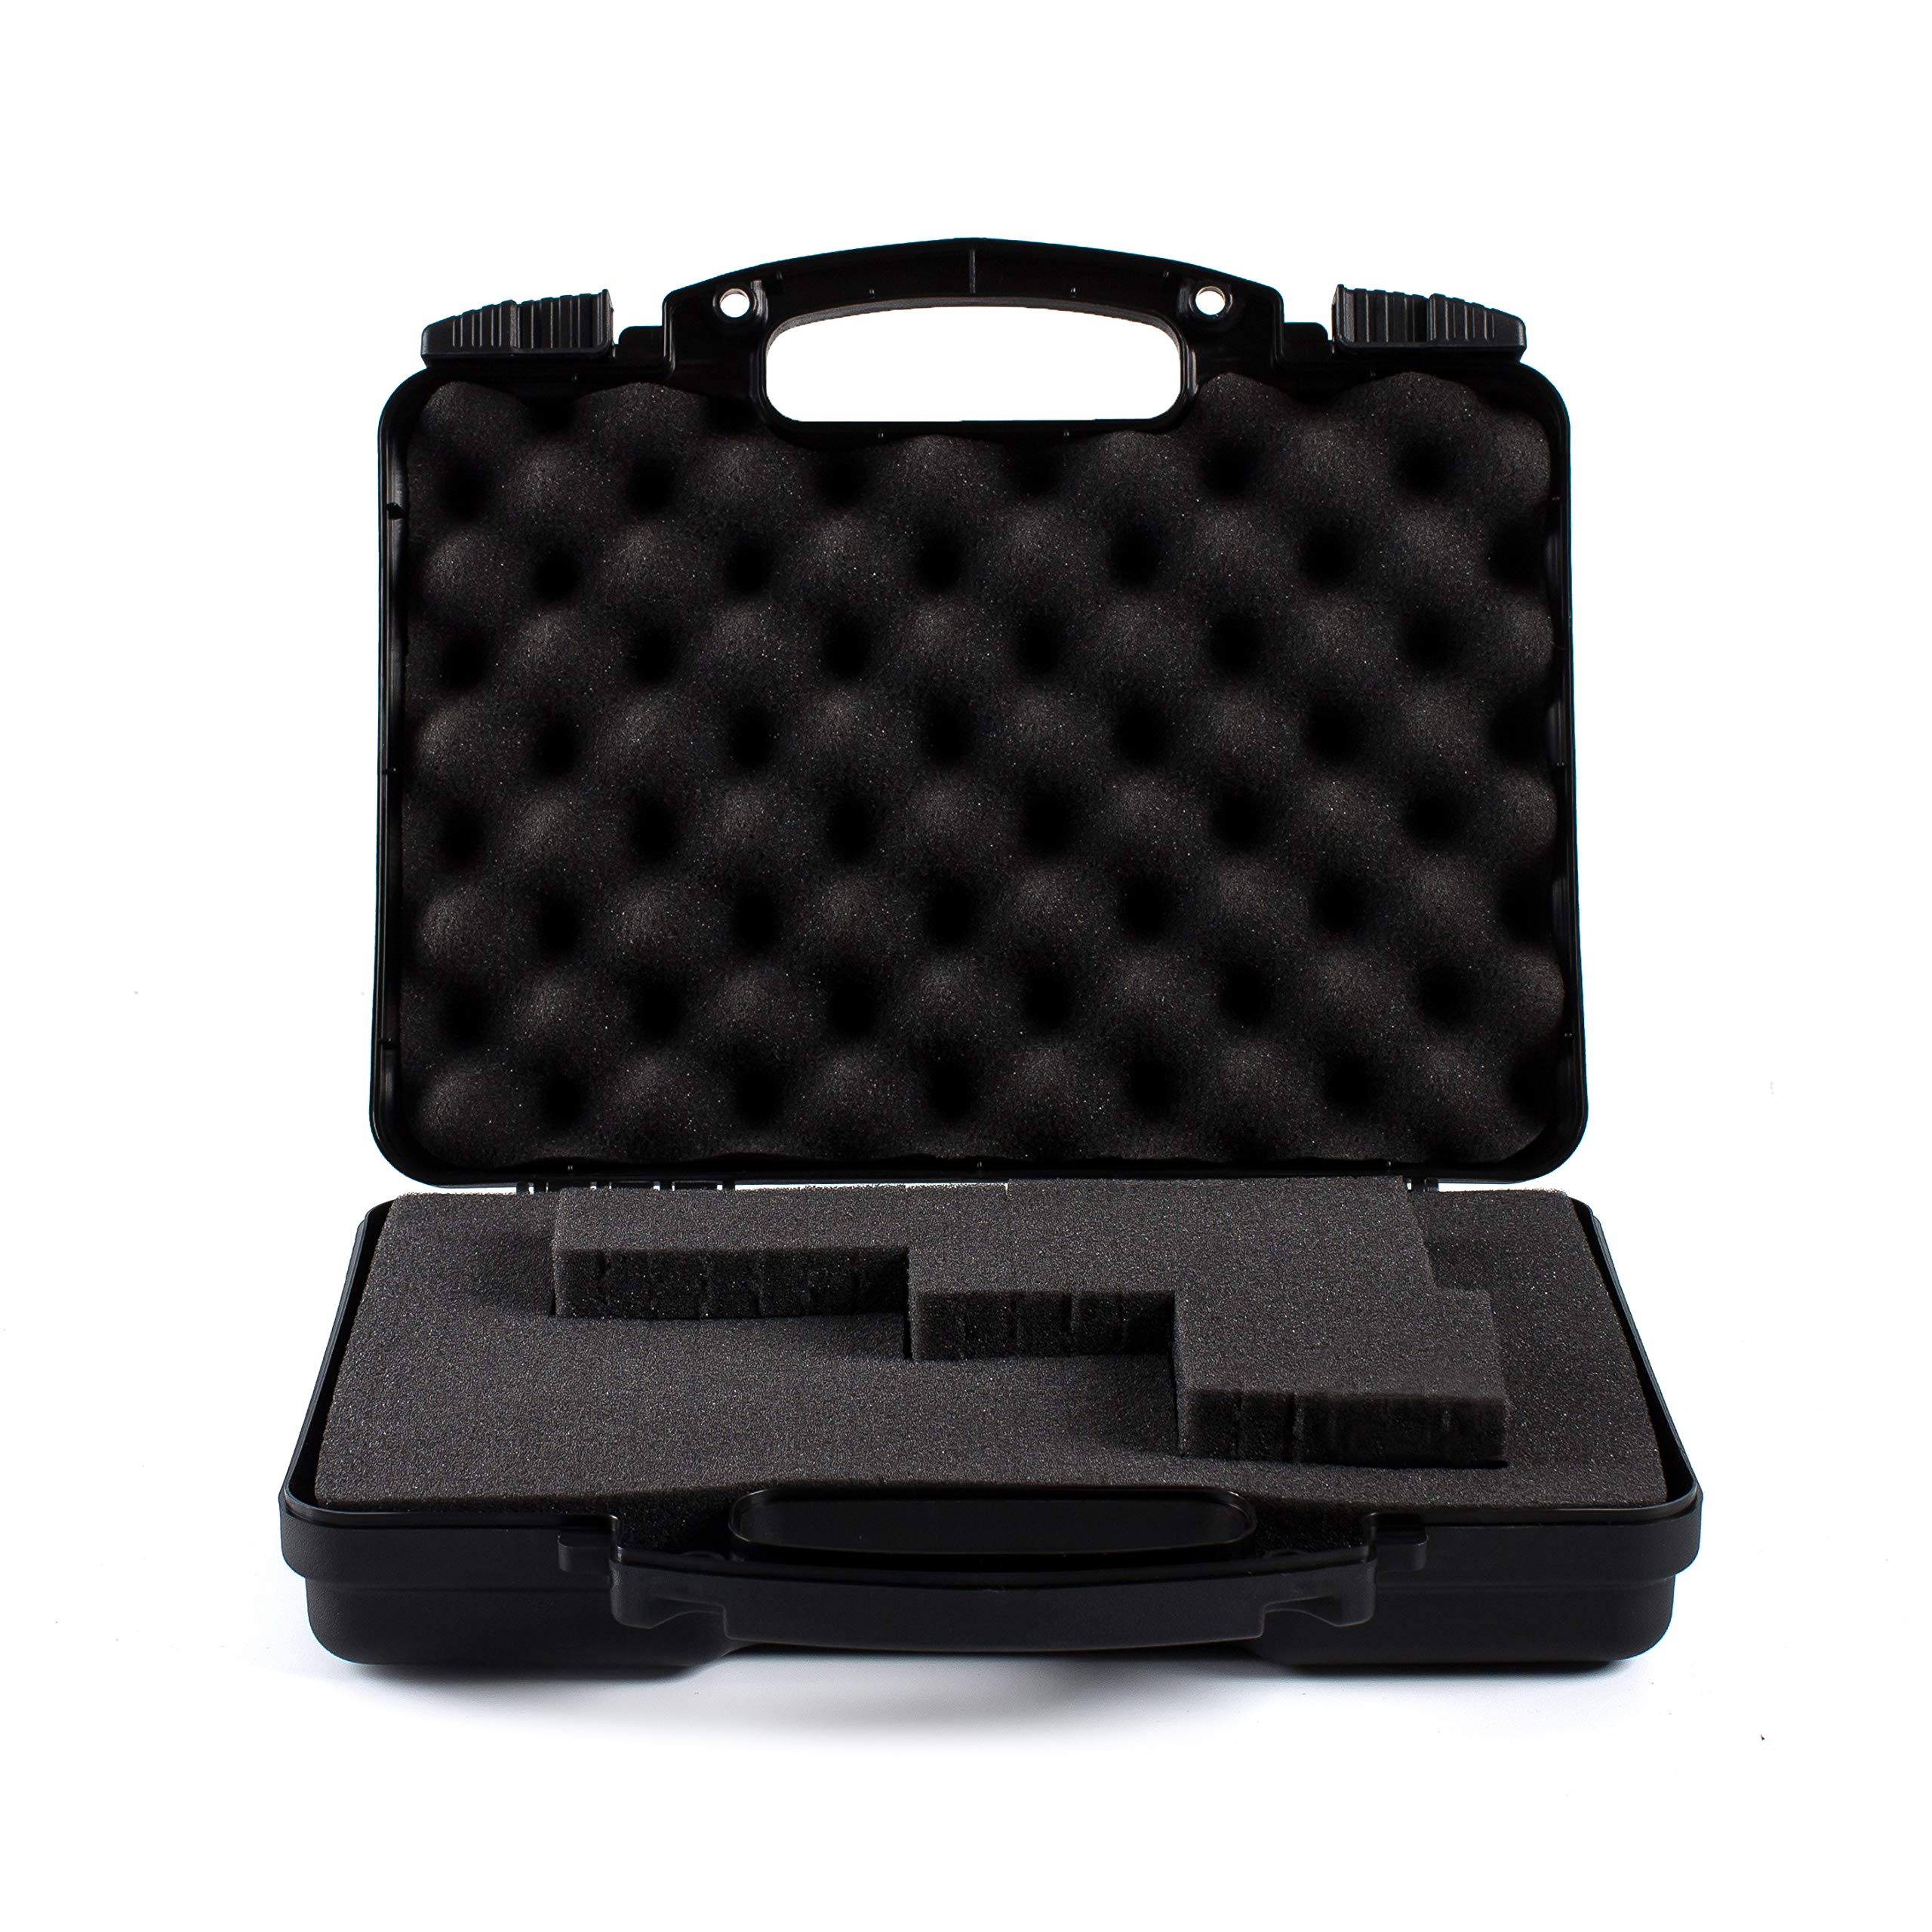 Daoe NWT110 Lockable Hard Pistol Gun Case with Pluckable Foam, TSA Approved